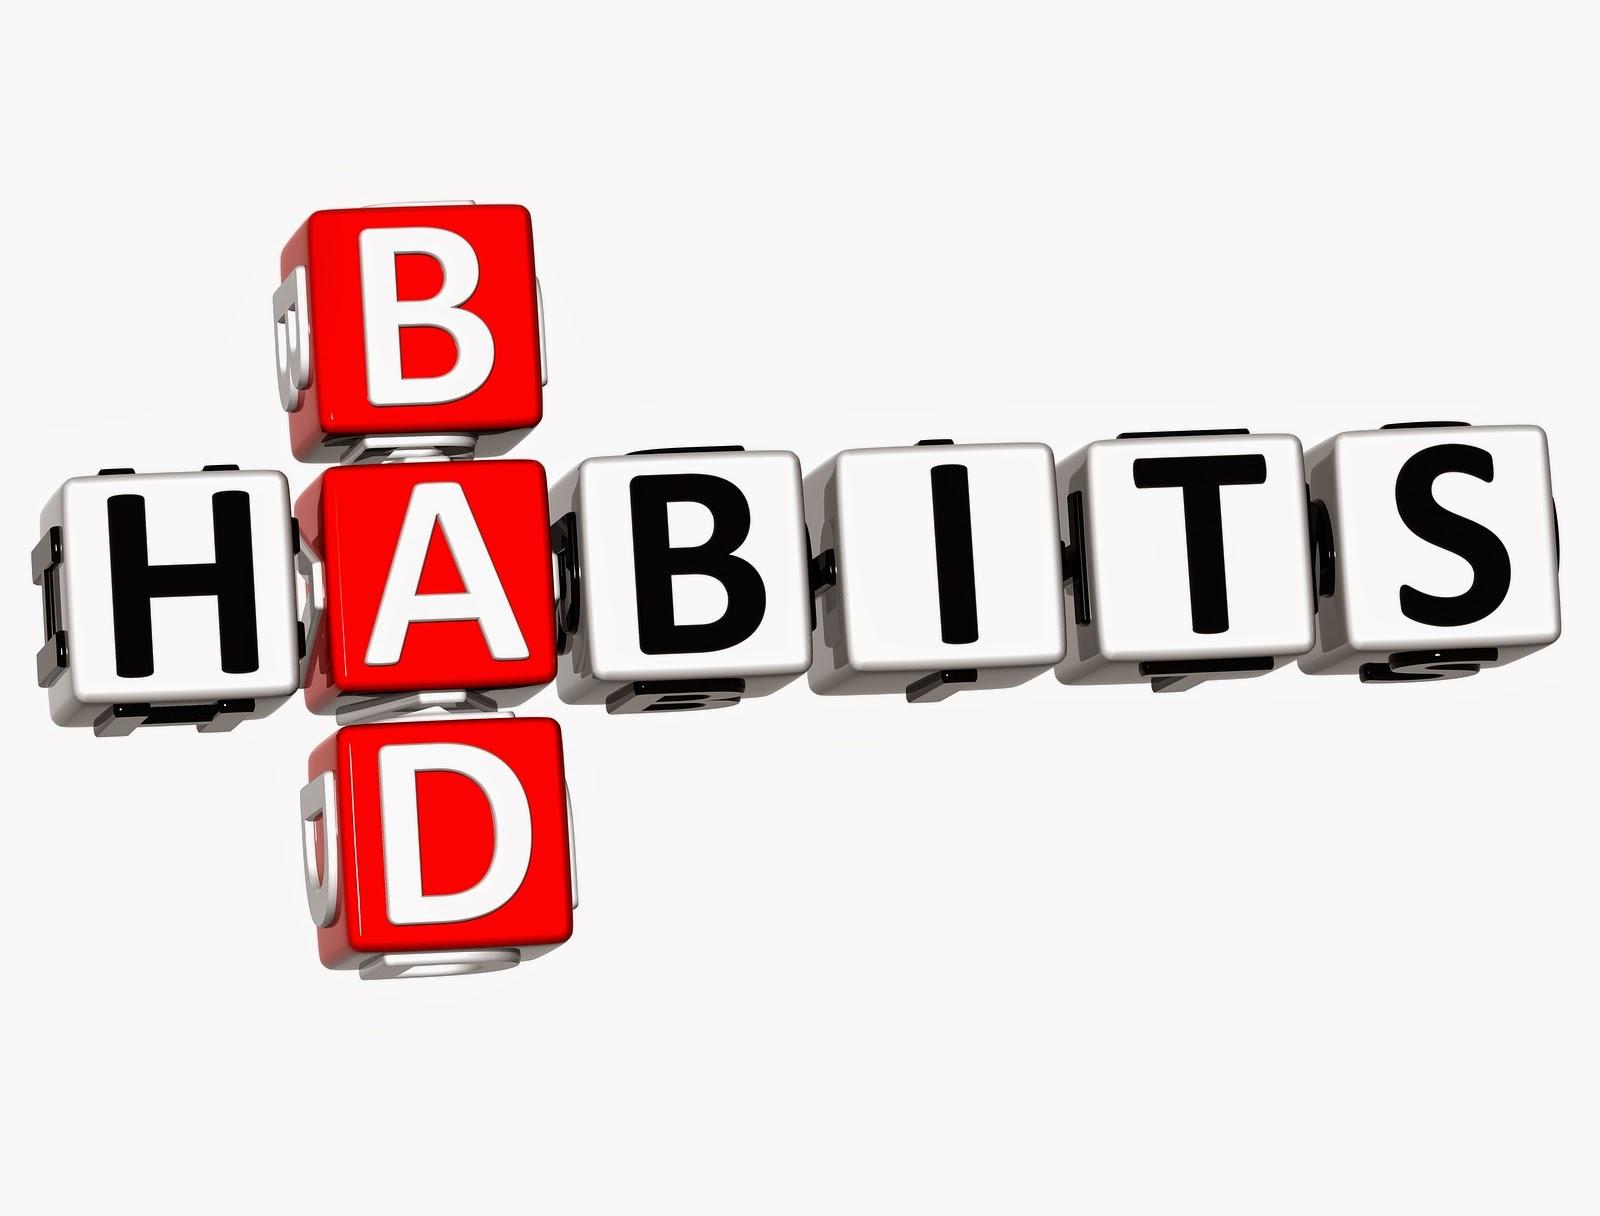 Bye bye to Bad Habits - Astro Upay for Bad Habits